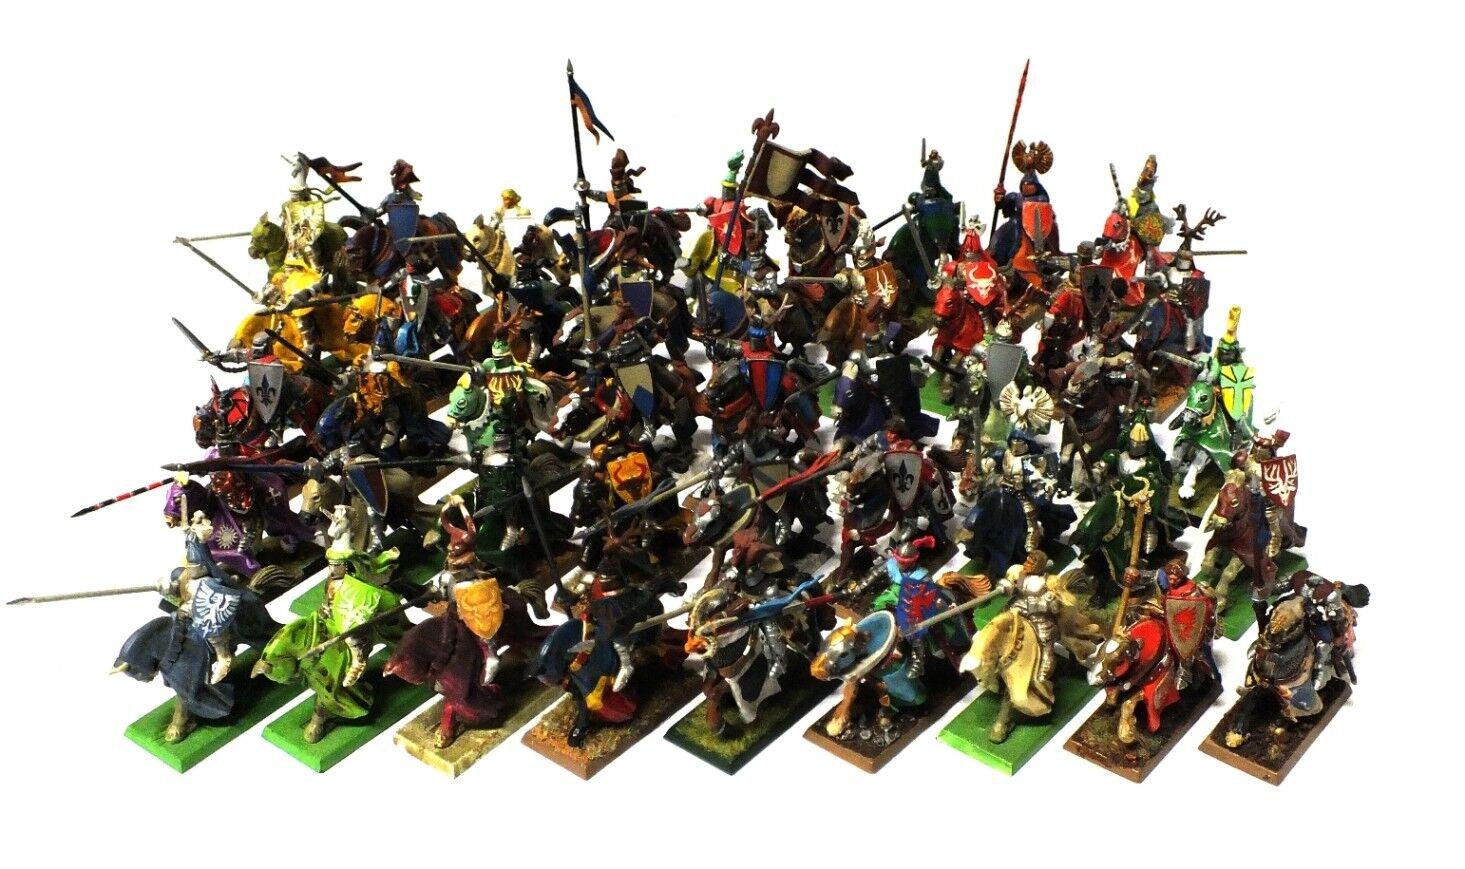 Warhammer Fantasia - Bretonnian Knights (Painted) - 28mm